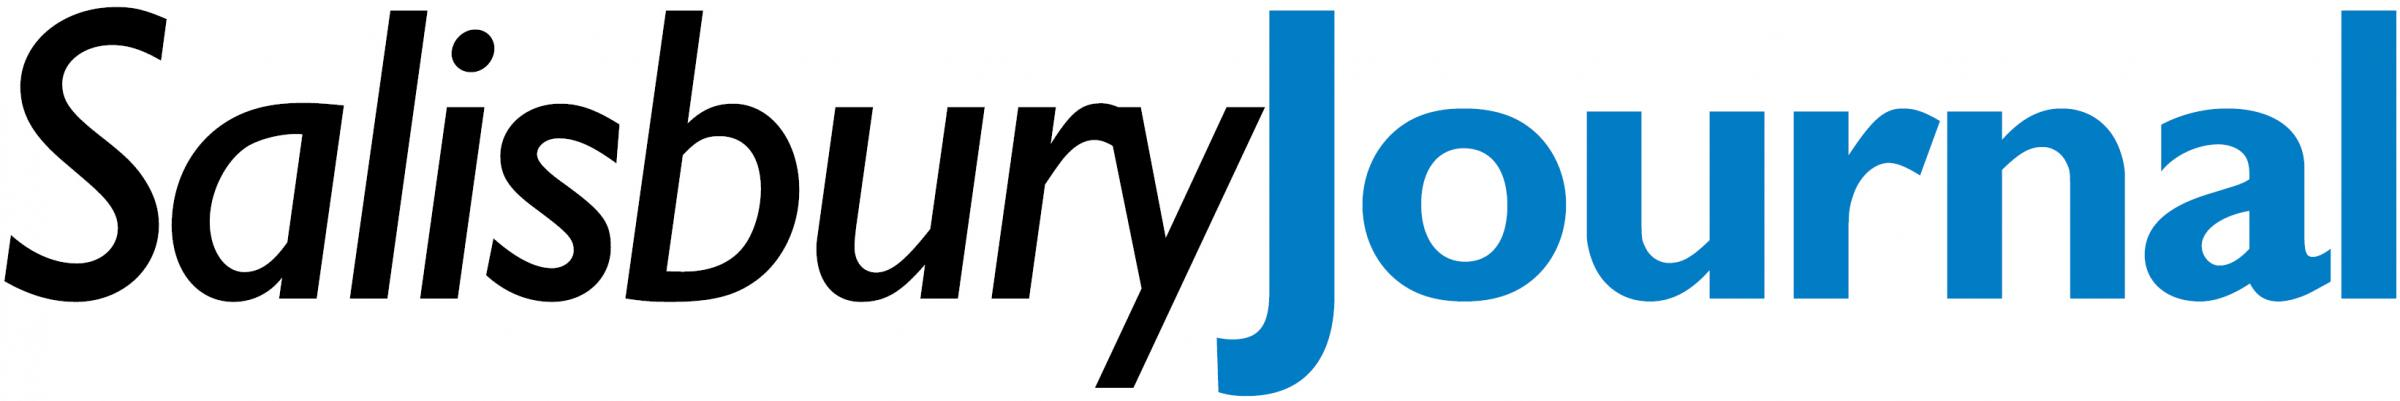 Salisbury Journal Logo